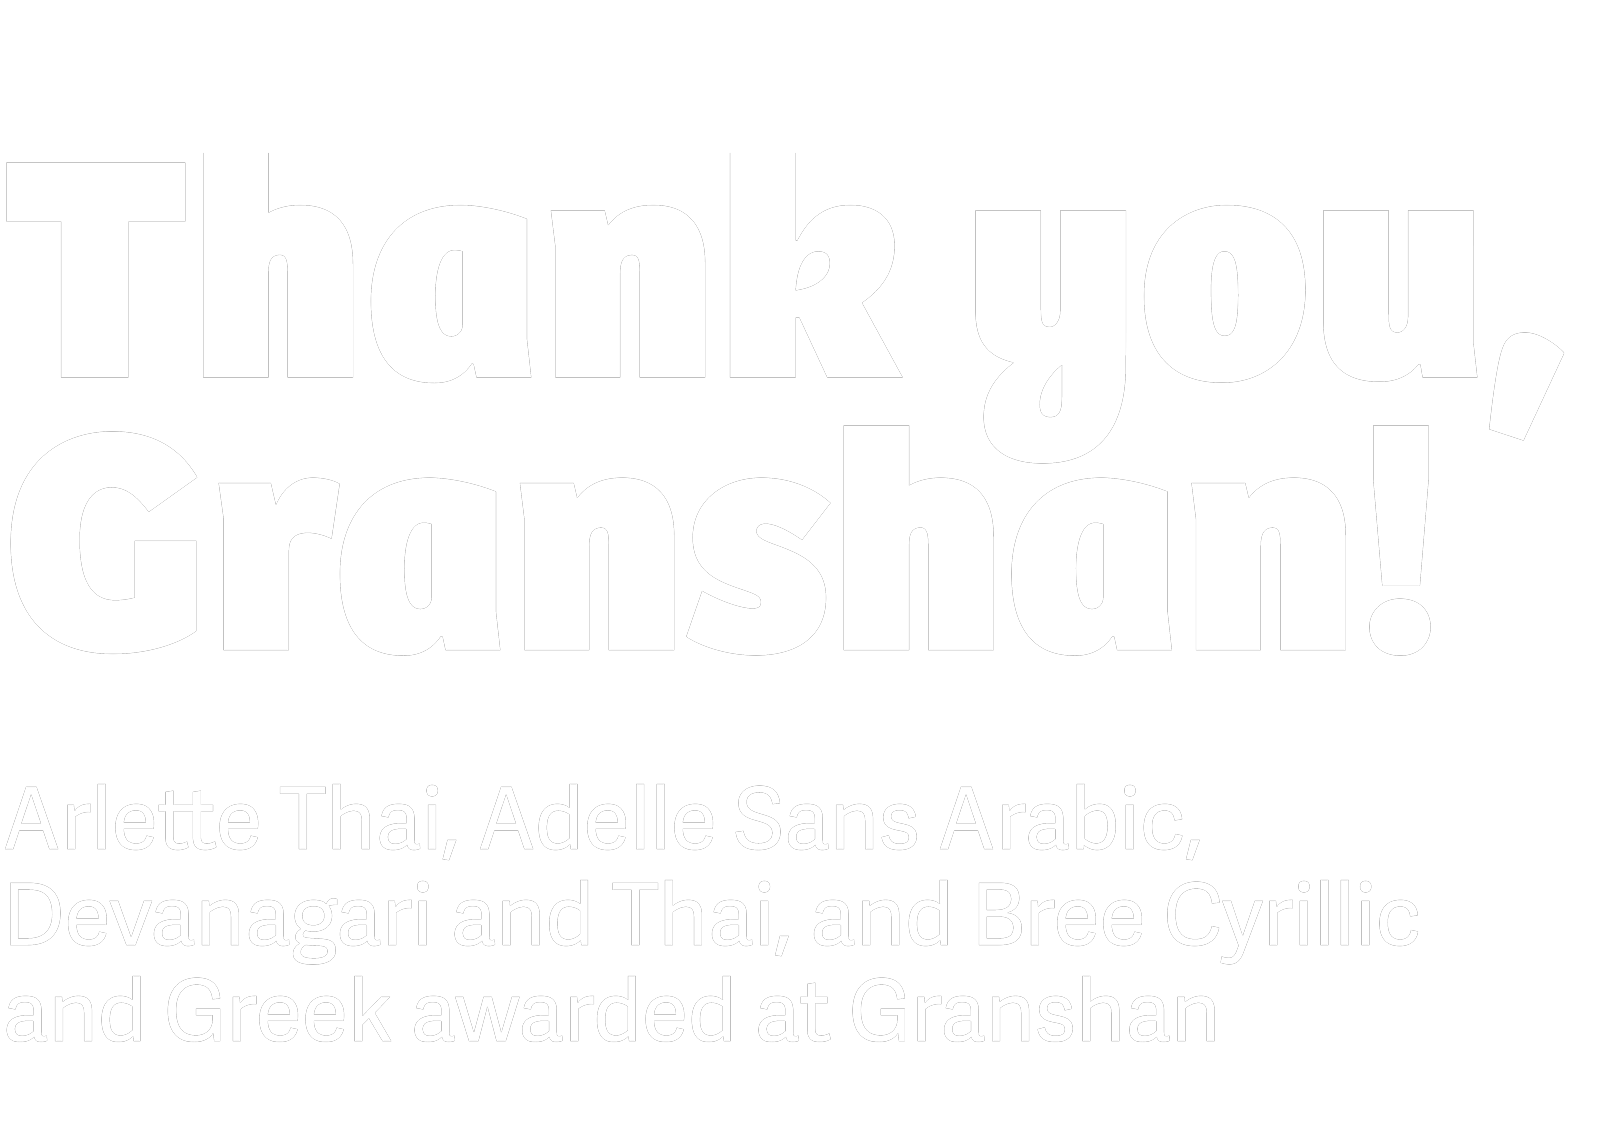 Arlette, Adelle Sans and Bree in Granshan Awards